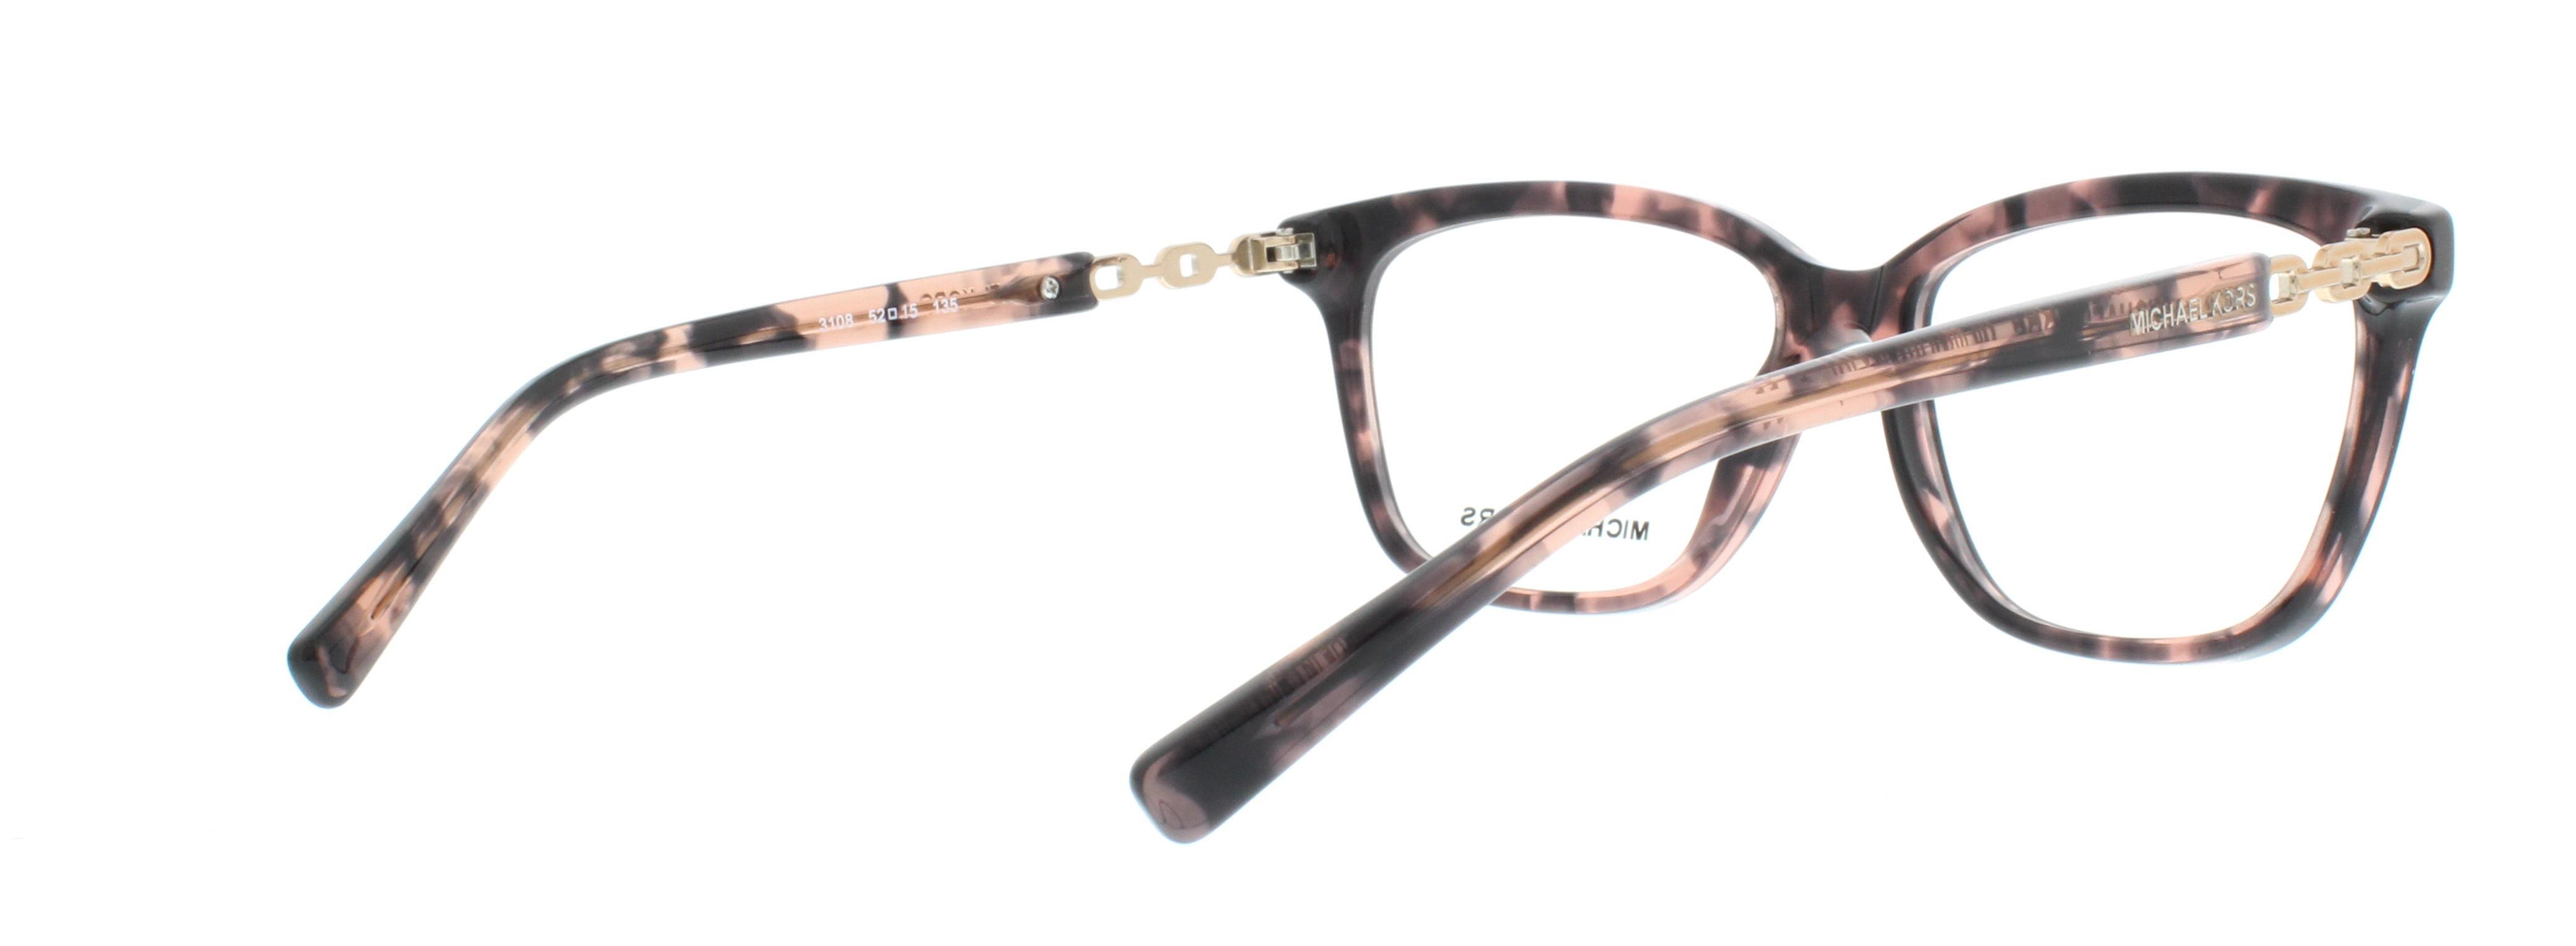 a31f2dc7713 MICHAEL KORS Eyeglasses MK 8018 3108 Pink Tortoise Rose Gold 52MM -  Walmart.com